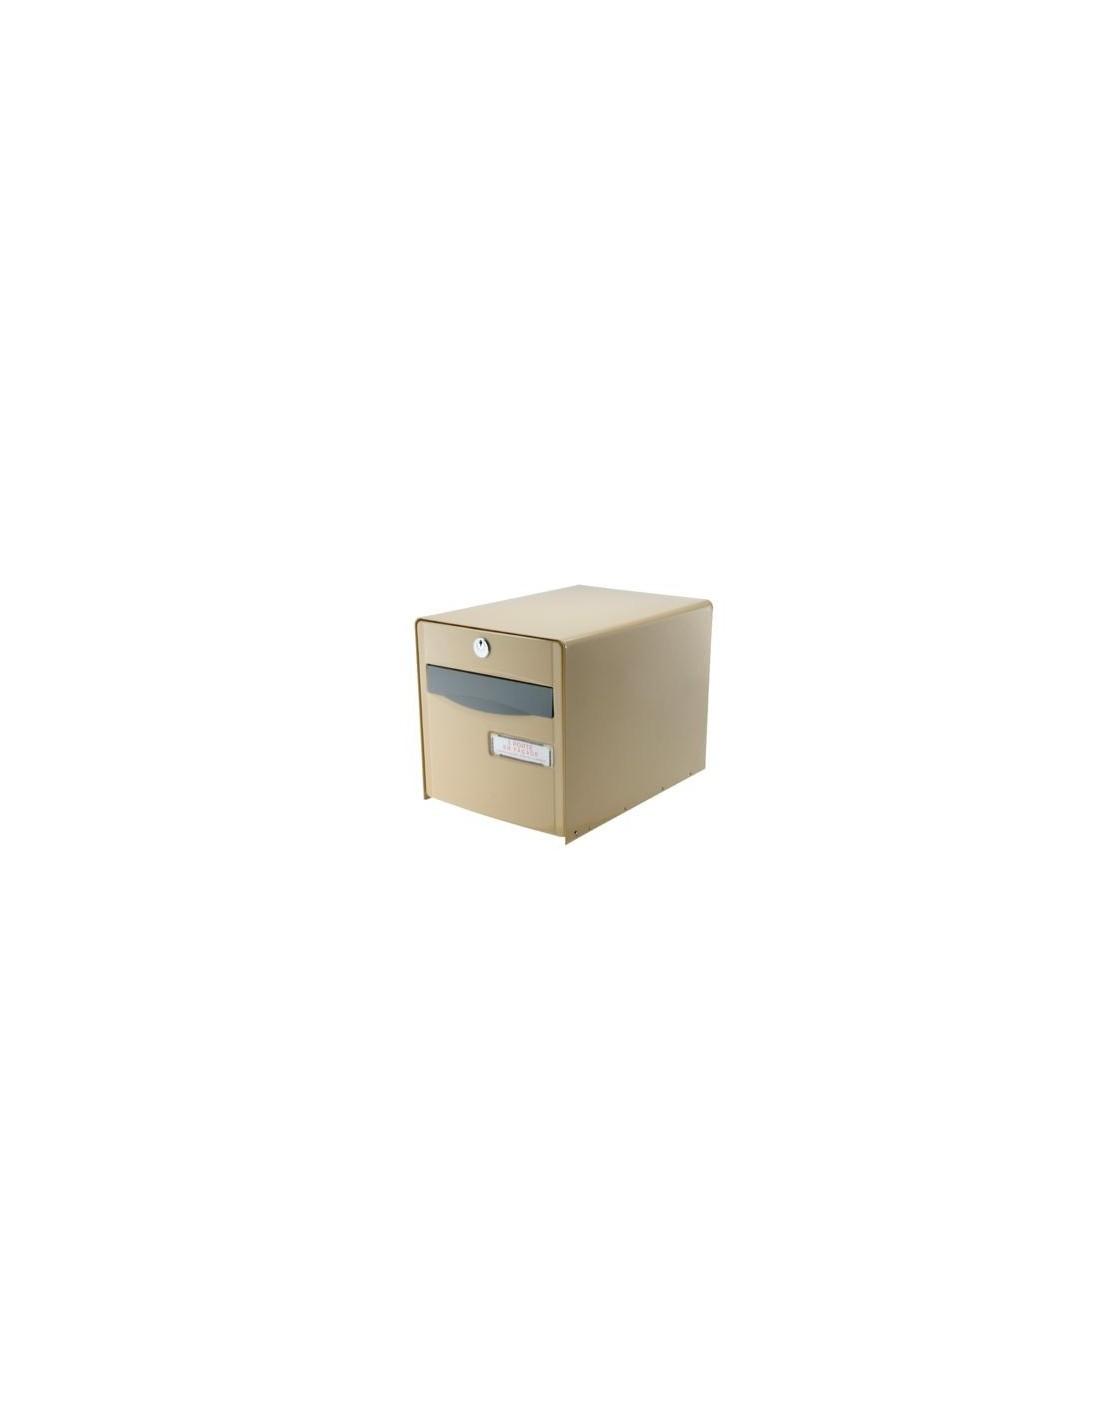 boite aux lettres simple face beige fa ade abattante boite aux lettres simple face beige 1 porte. Black Bedroom Furniture Sets. Home Design Ideas